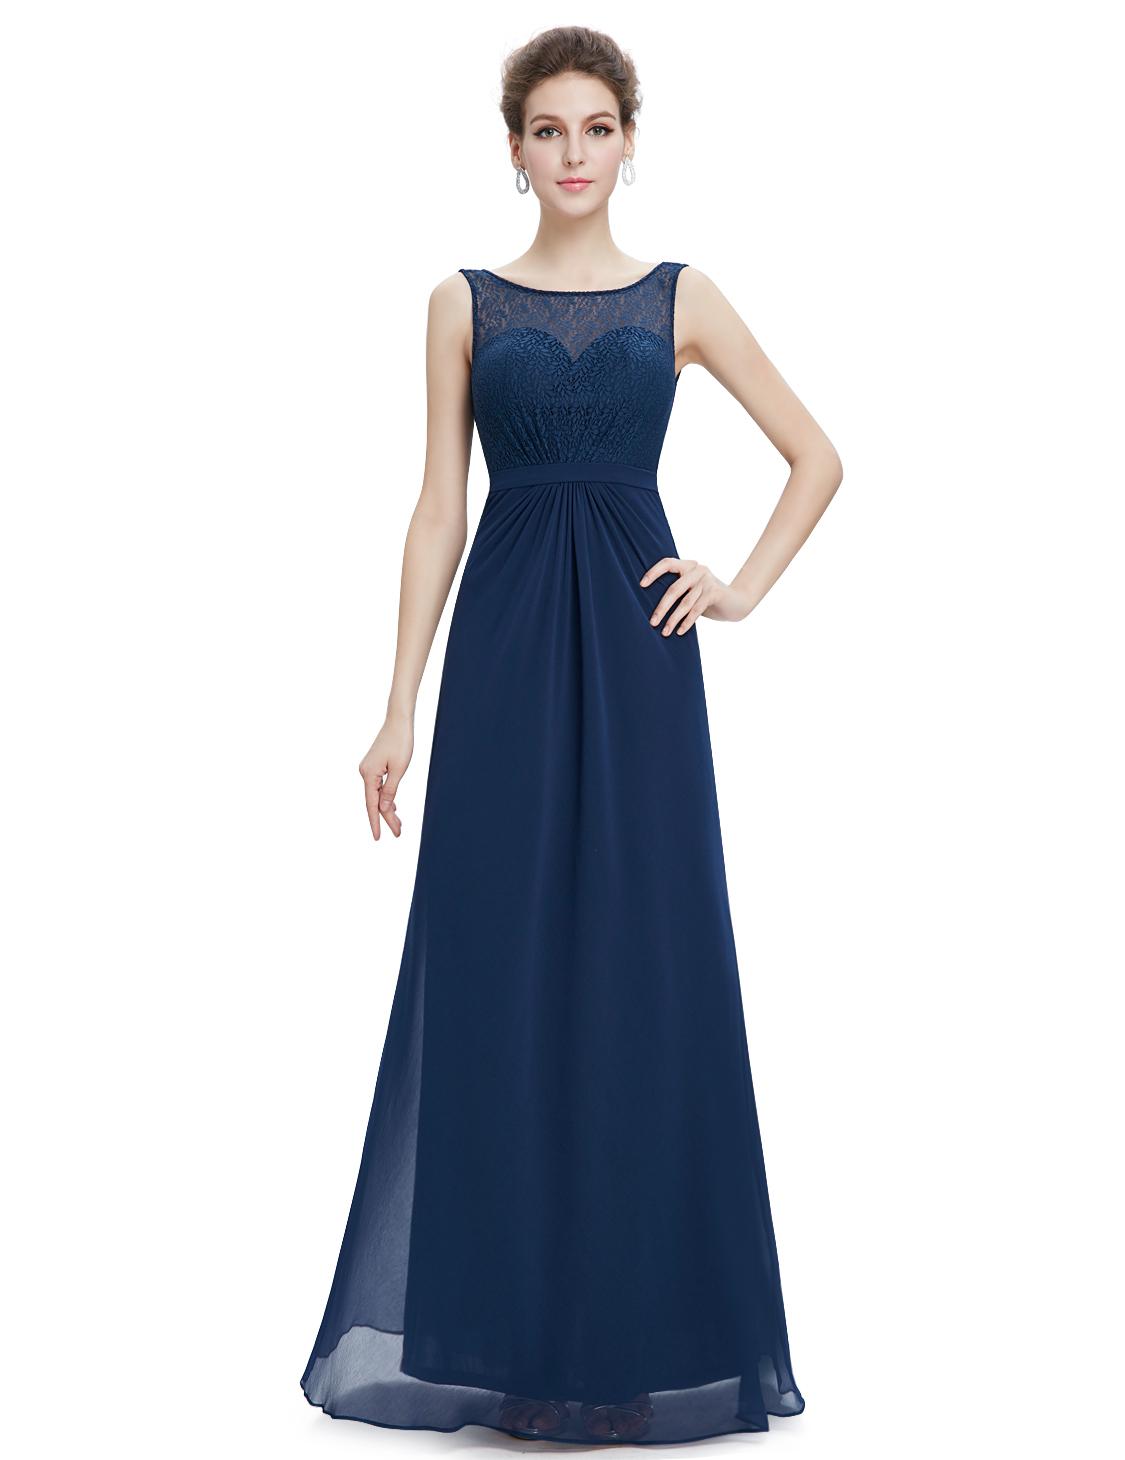 Elegant Navy Blue Long Chiffon Sheer Illusion Neckline Prom Dresses - $115.00